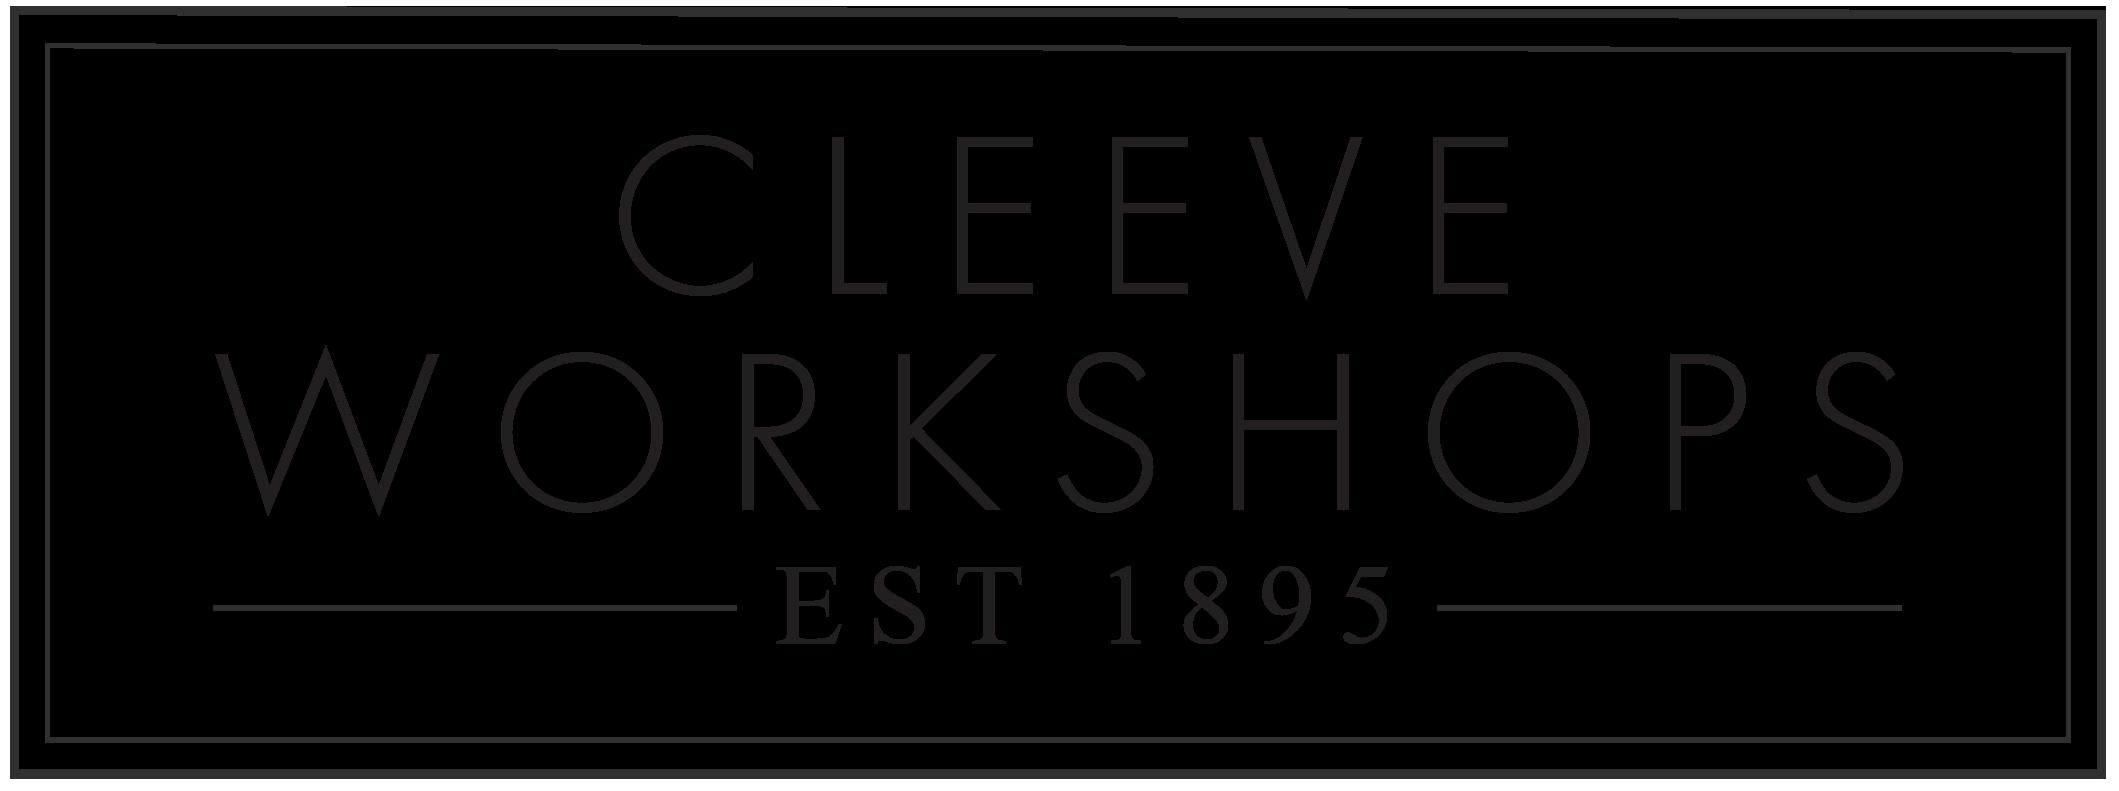 Cleeve Workshops logo